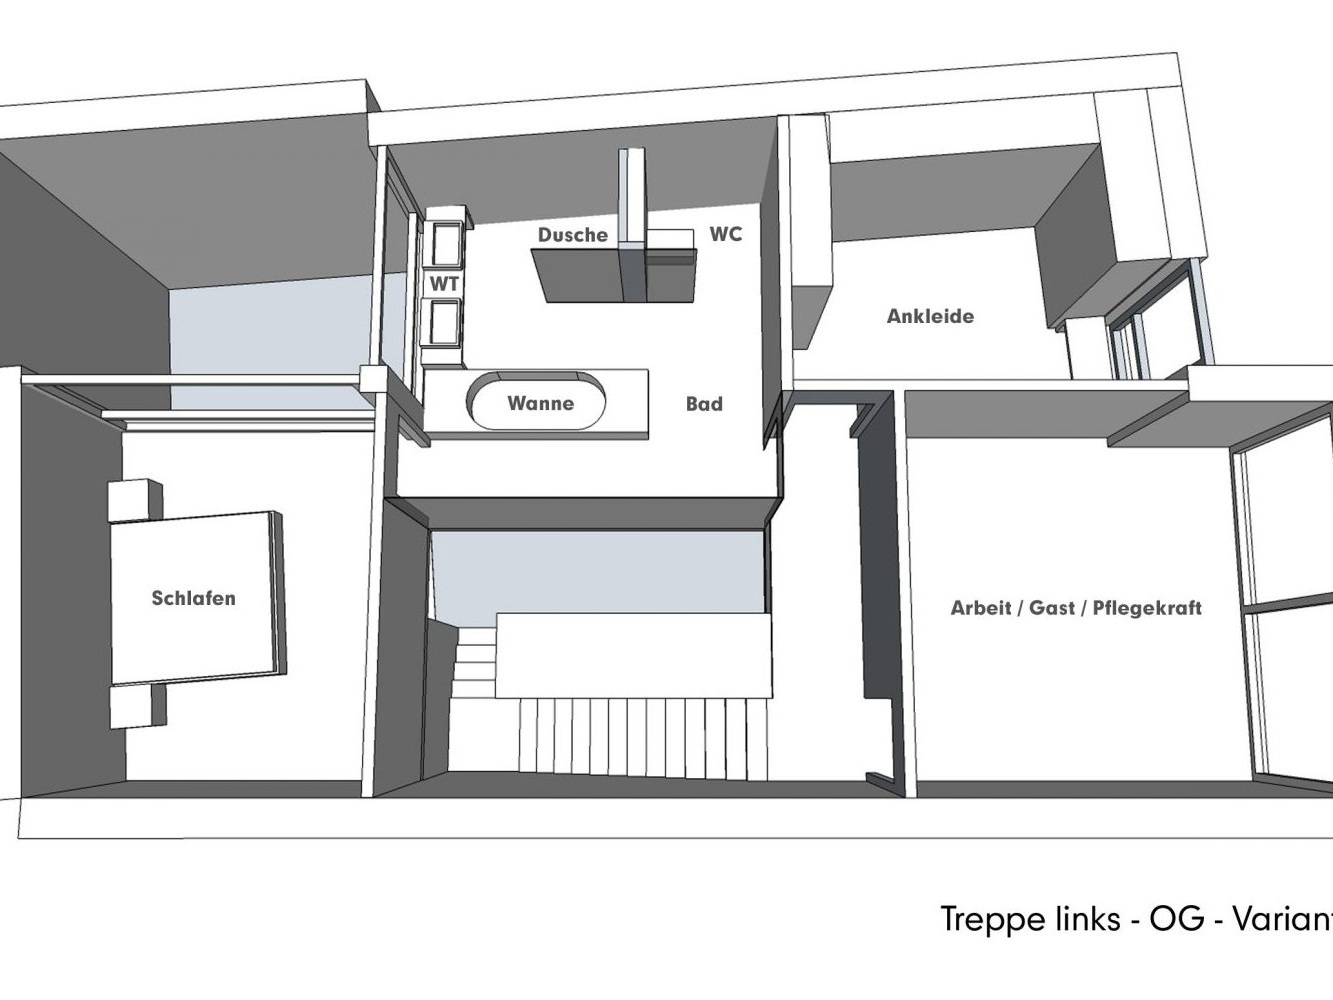 Nutzungskonzepte für Neubau - Treppe links - OG - Variante B